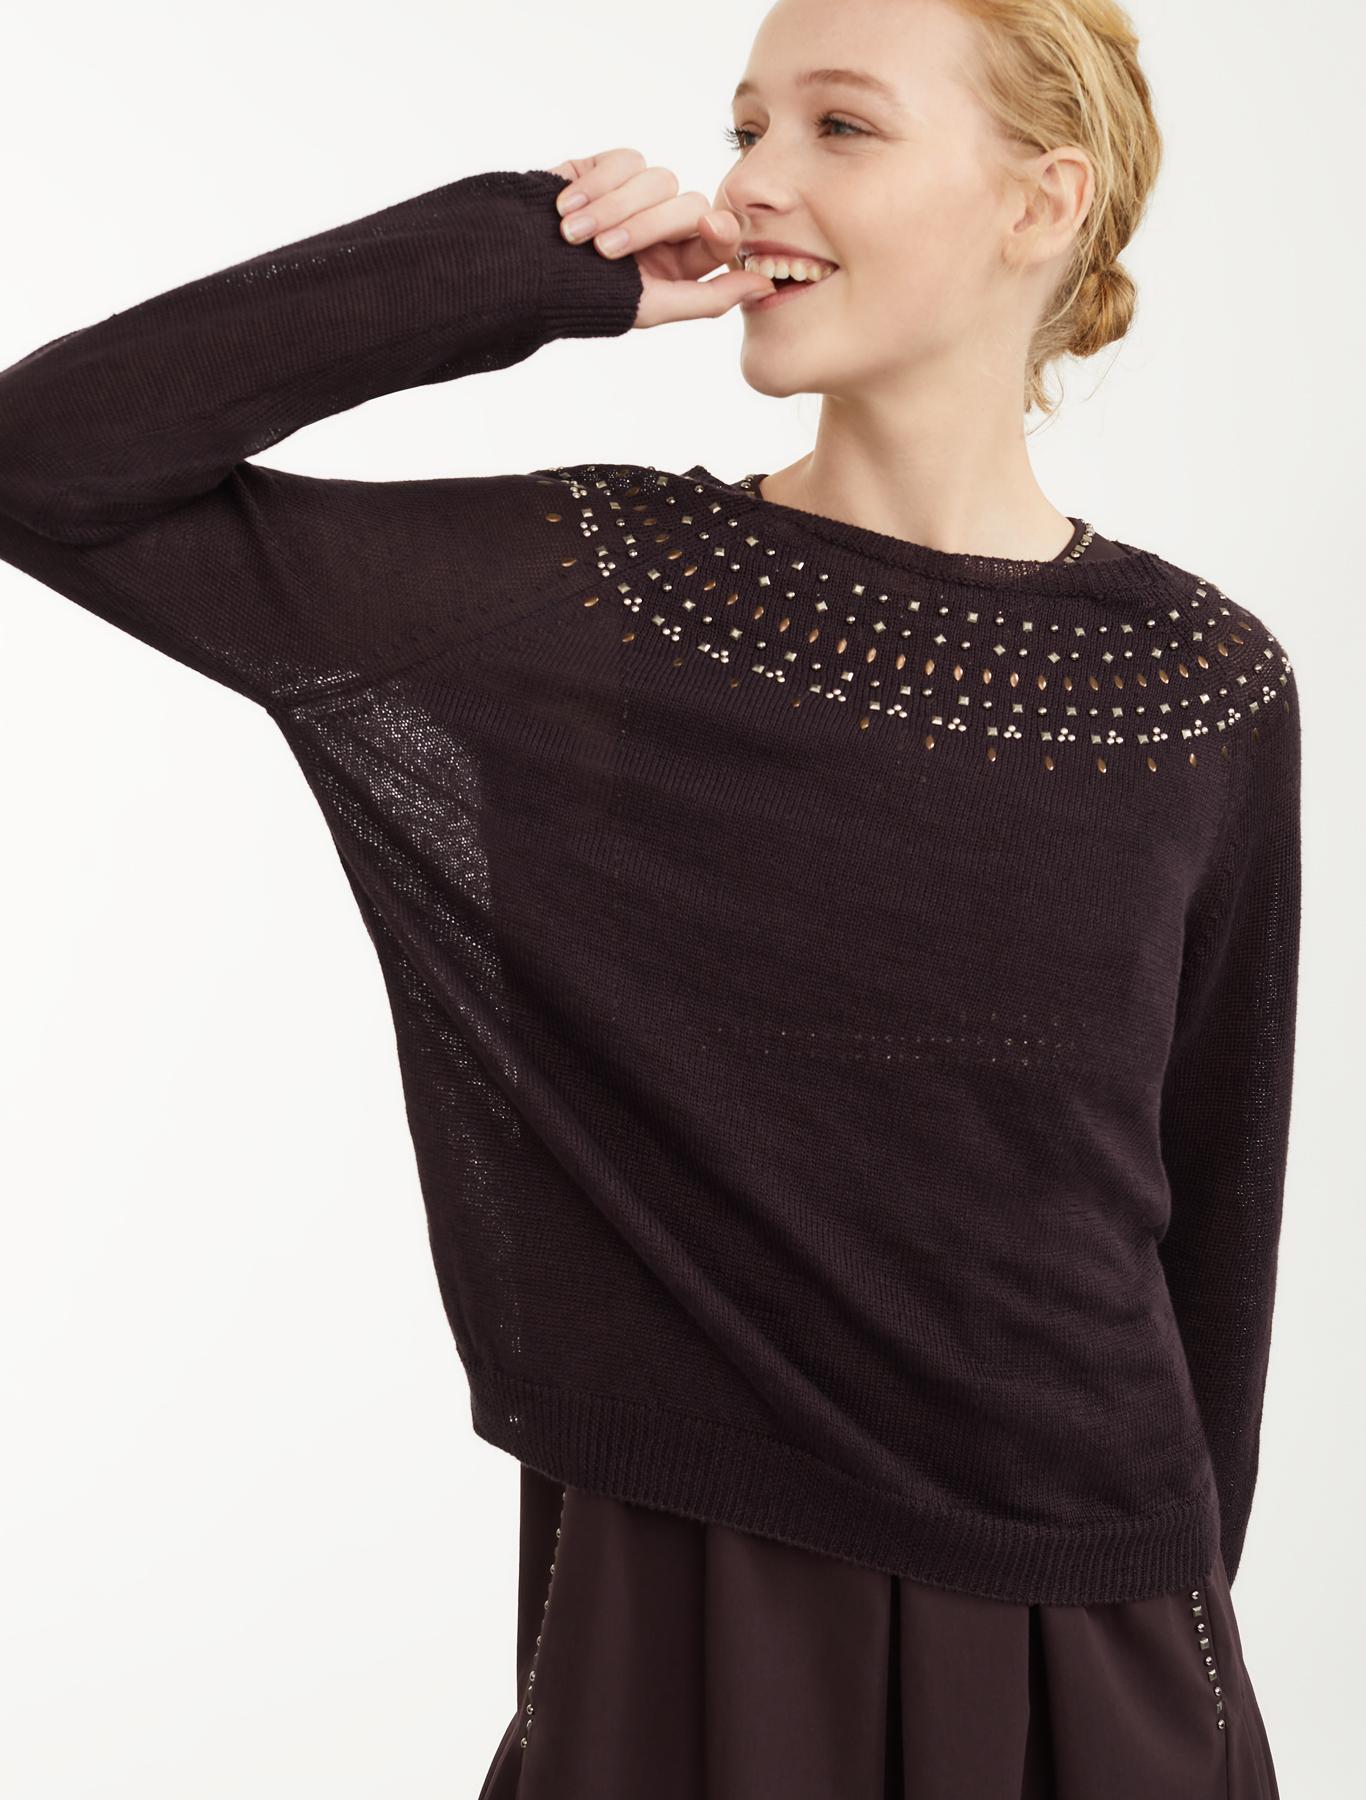 772ba80324cb Linen yarn jumper. £215.00. Linen yarn jumper Weekend Maxmara